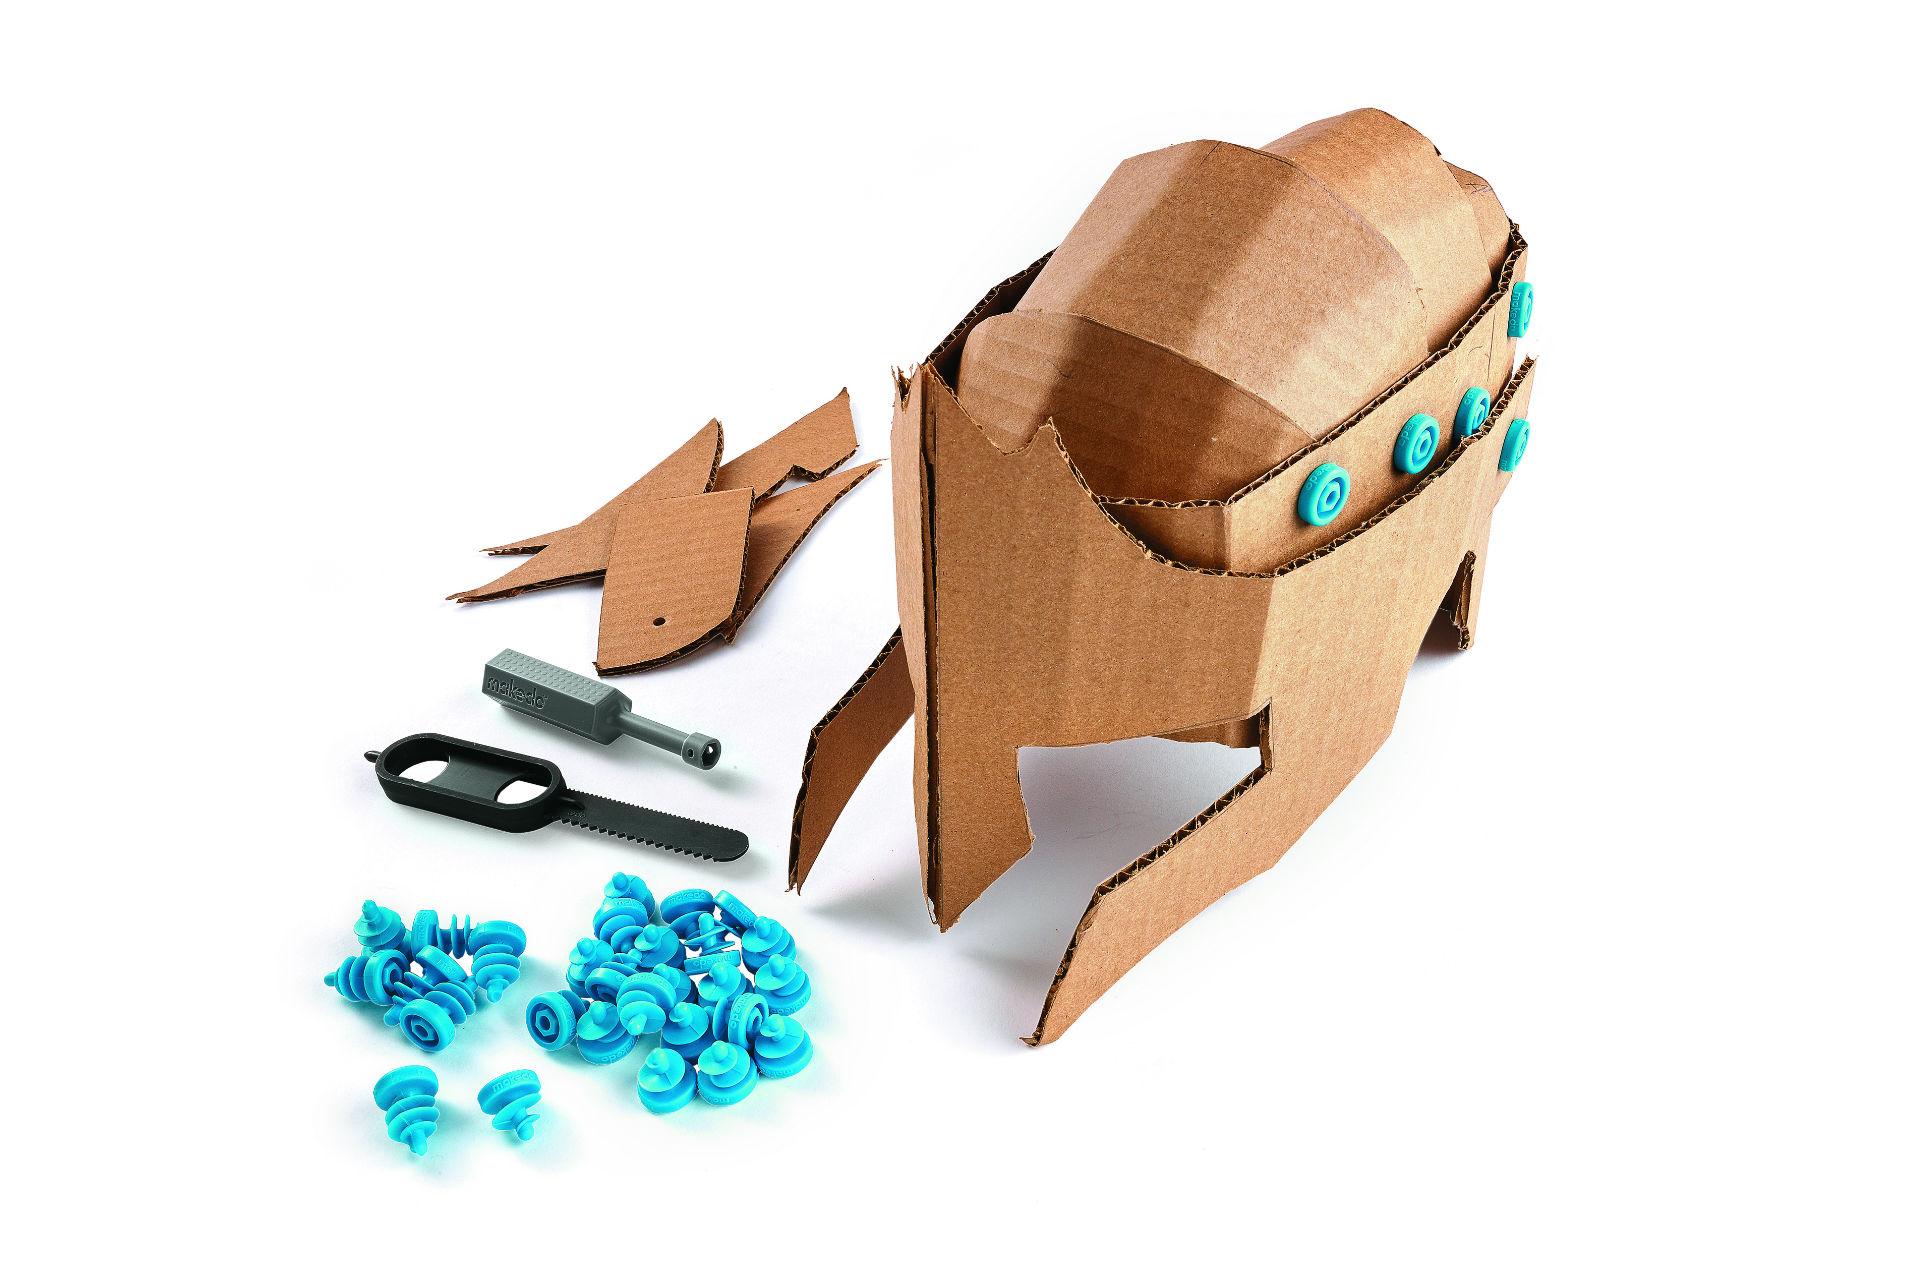 Makedo Cardboard Building System